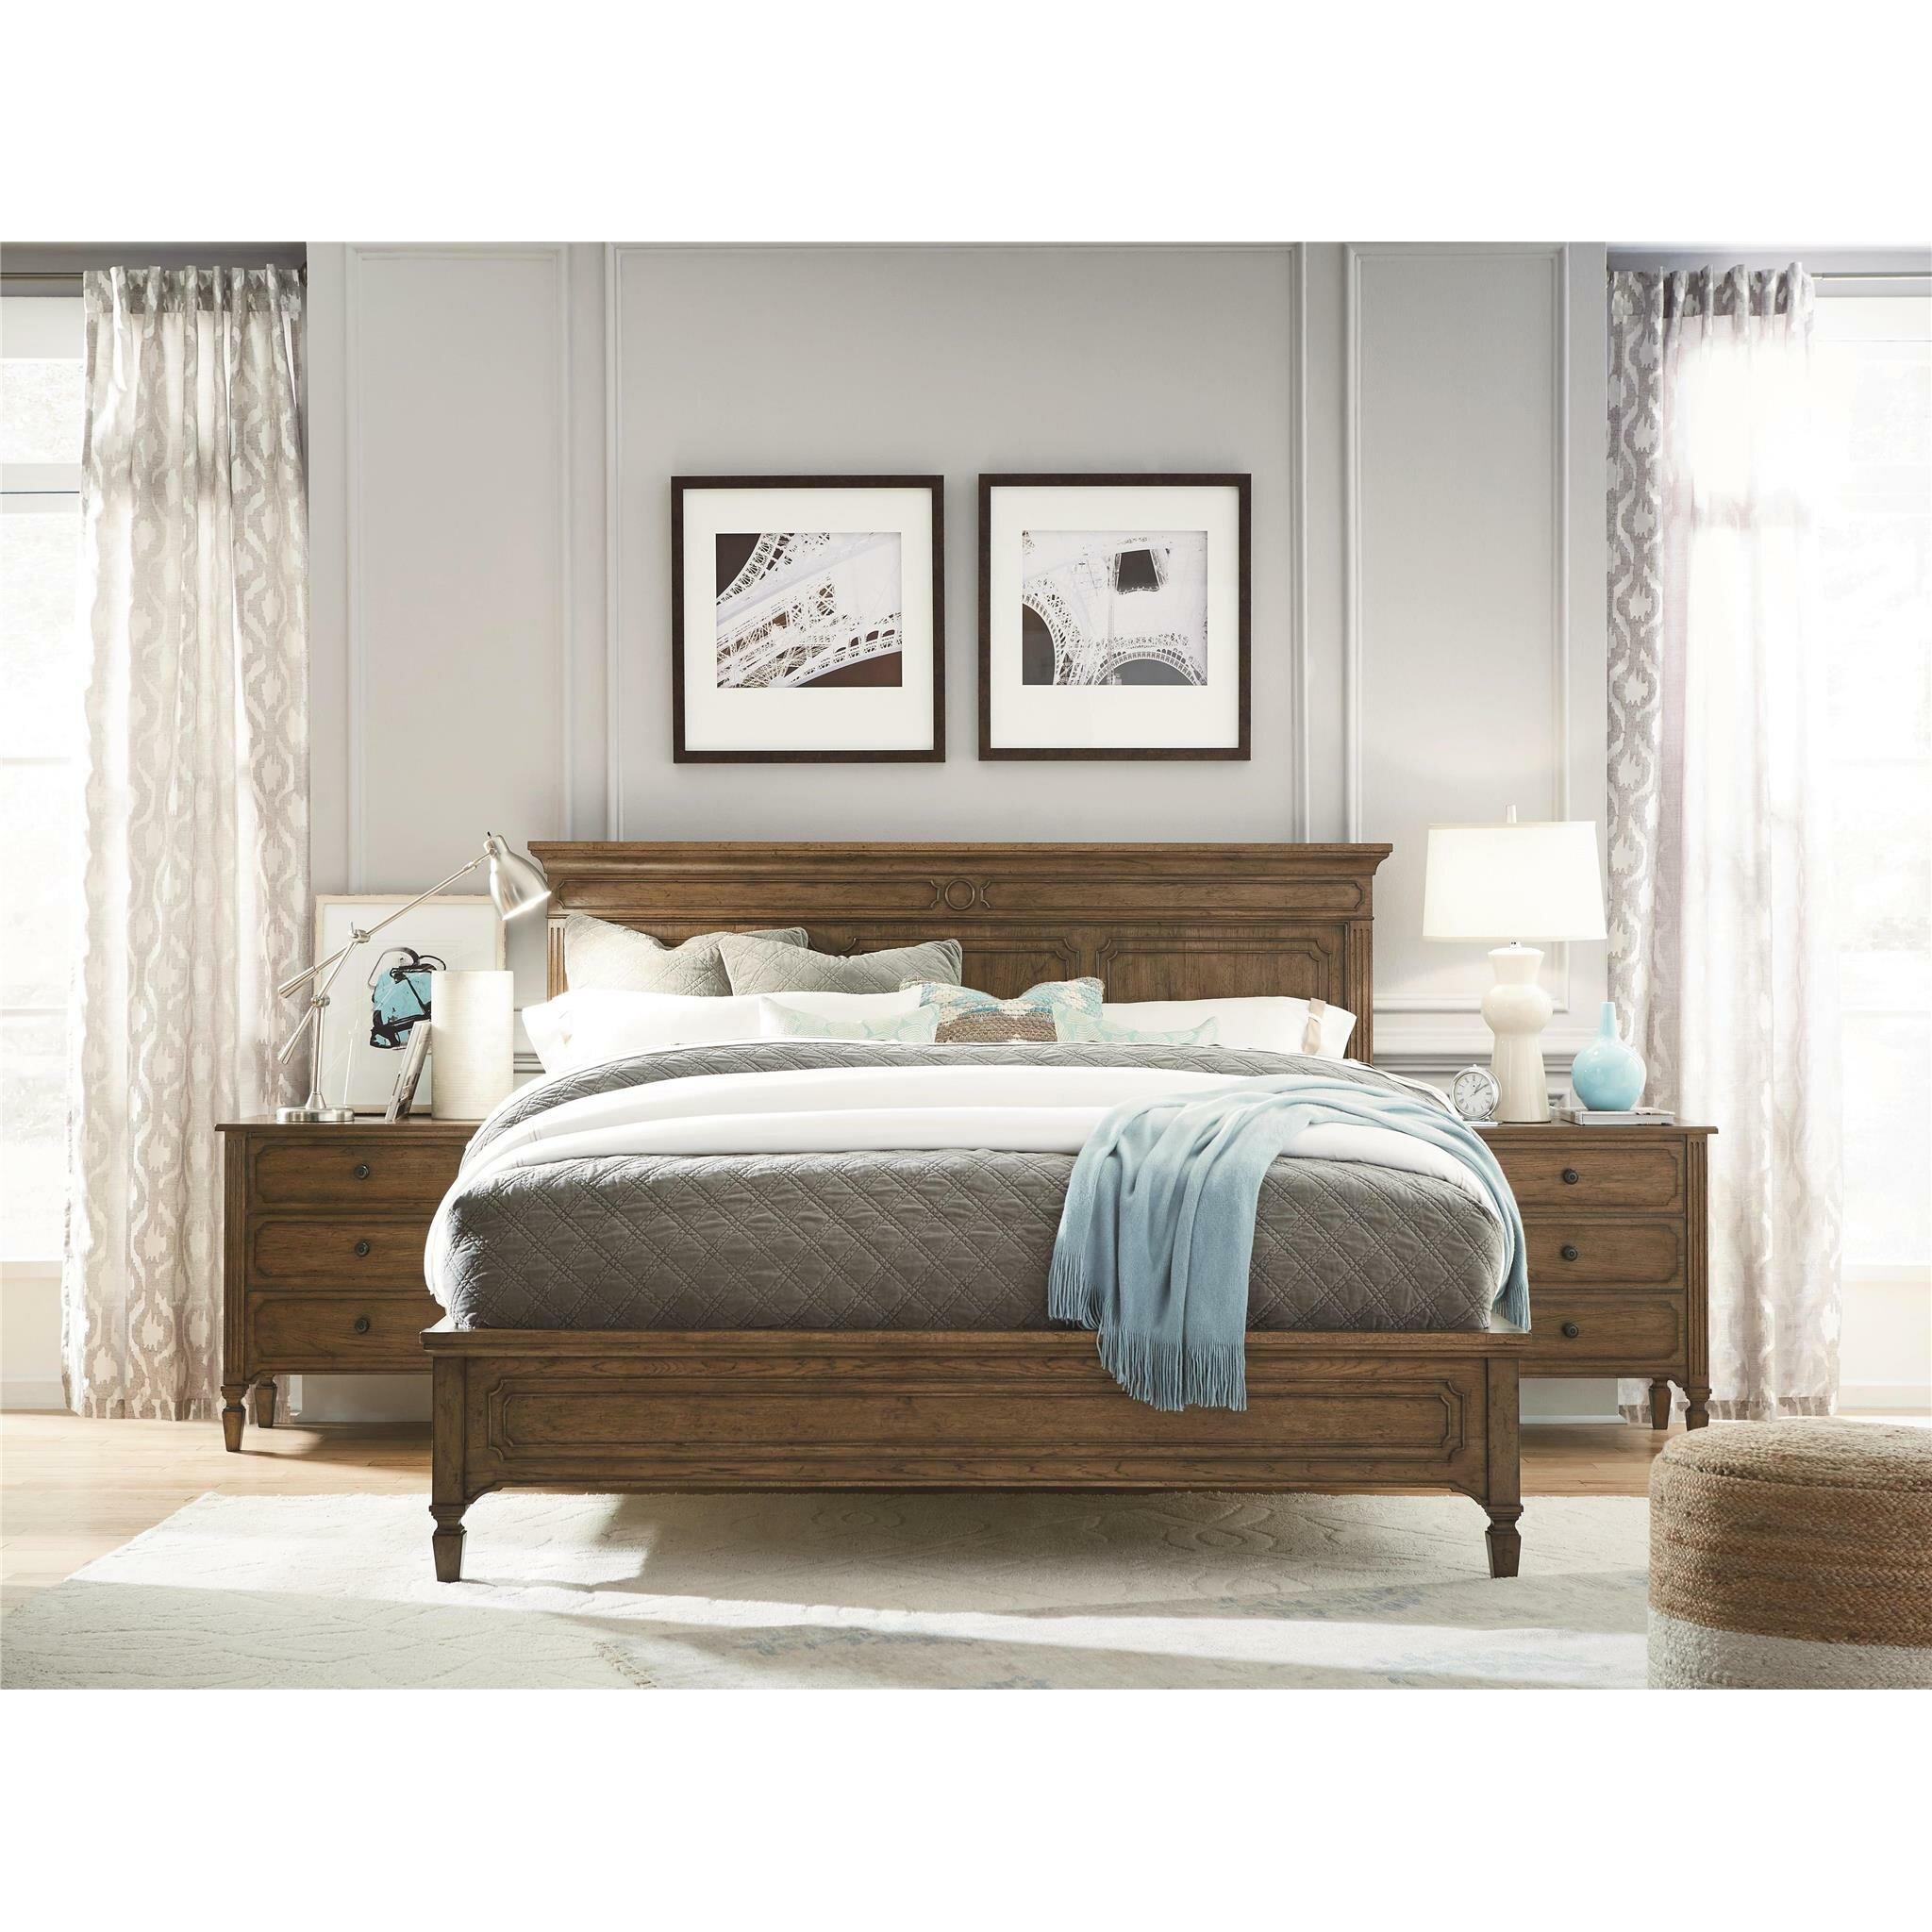 Darby Home Co Galyean Platform Customizable Bedroom Set Reviews Wayfair